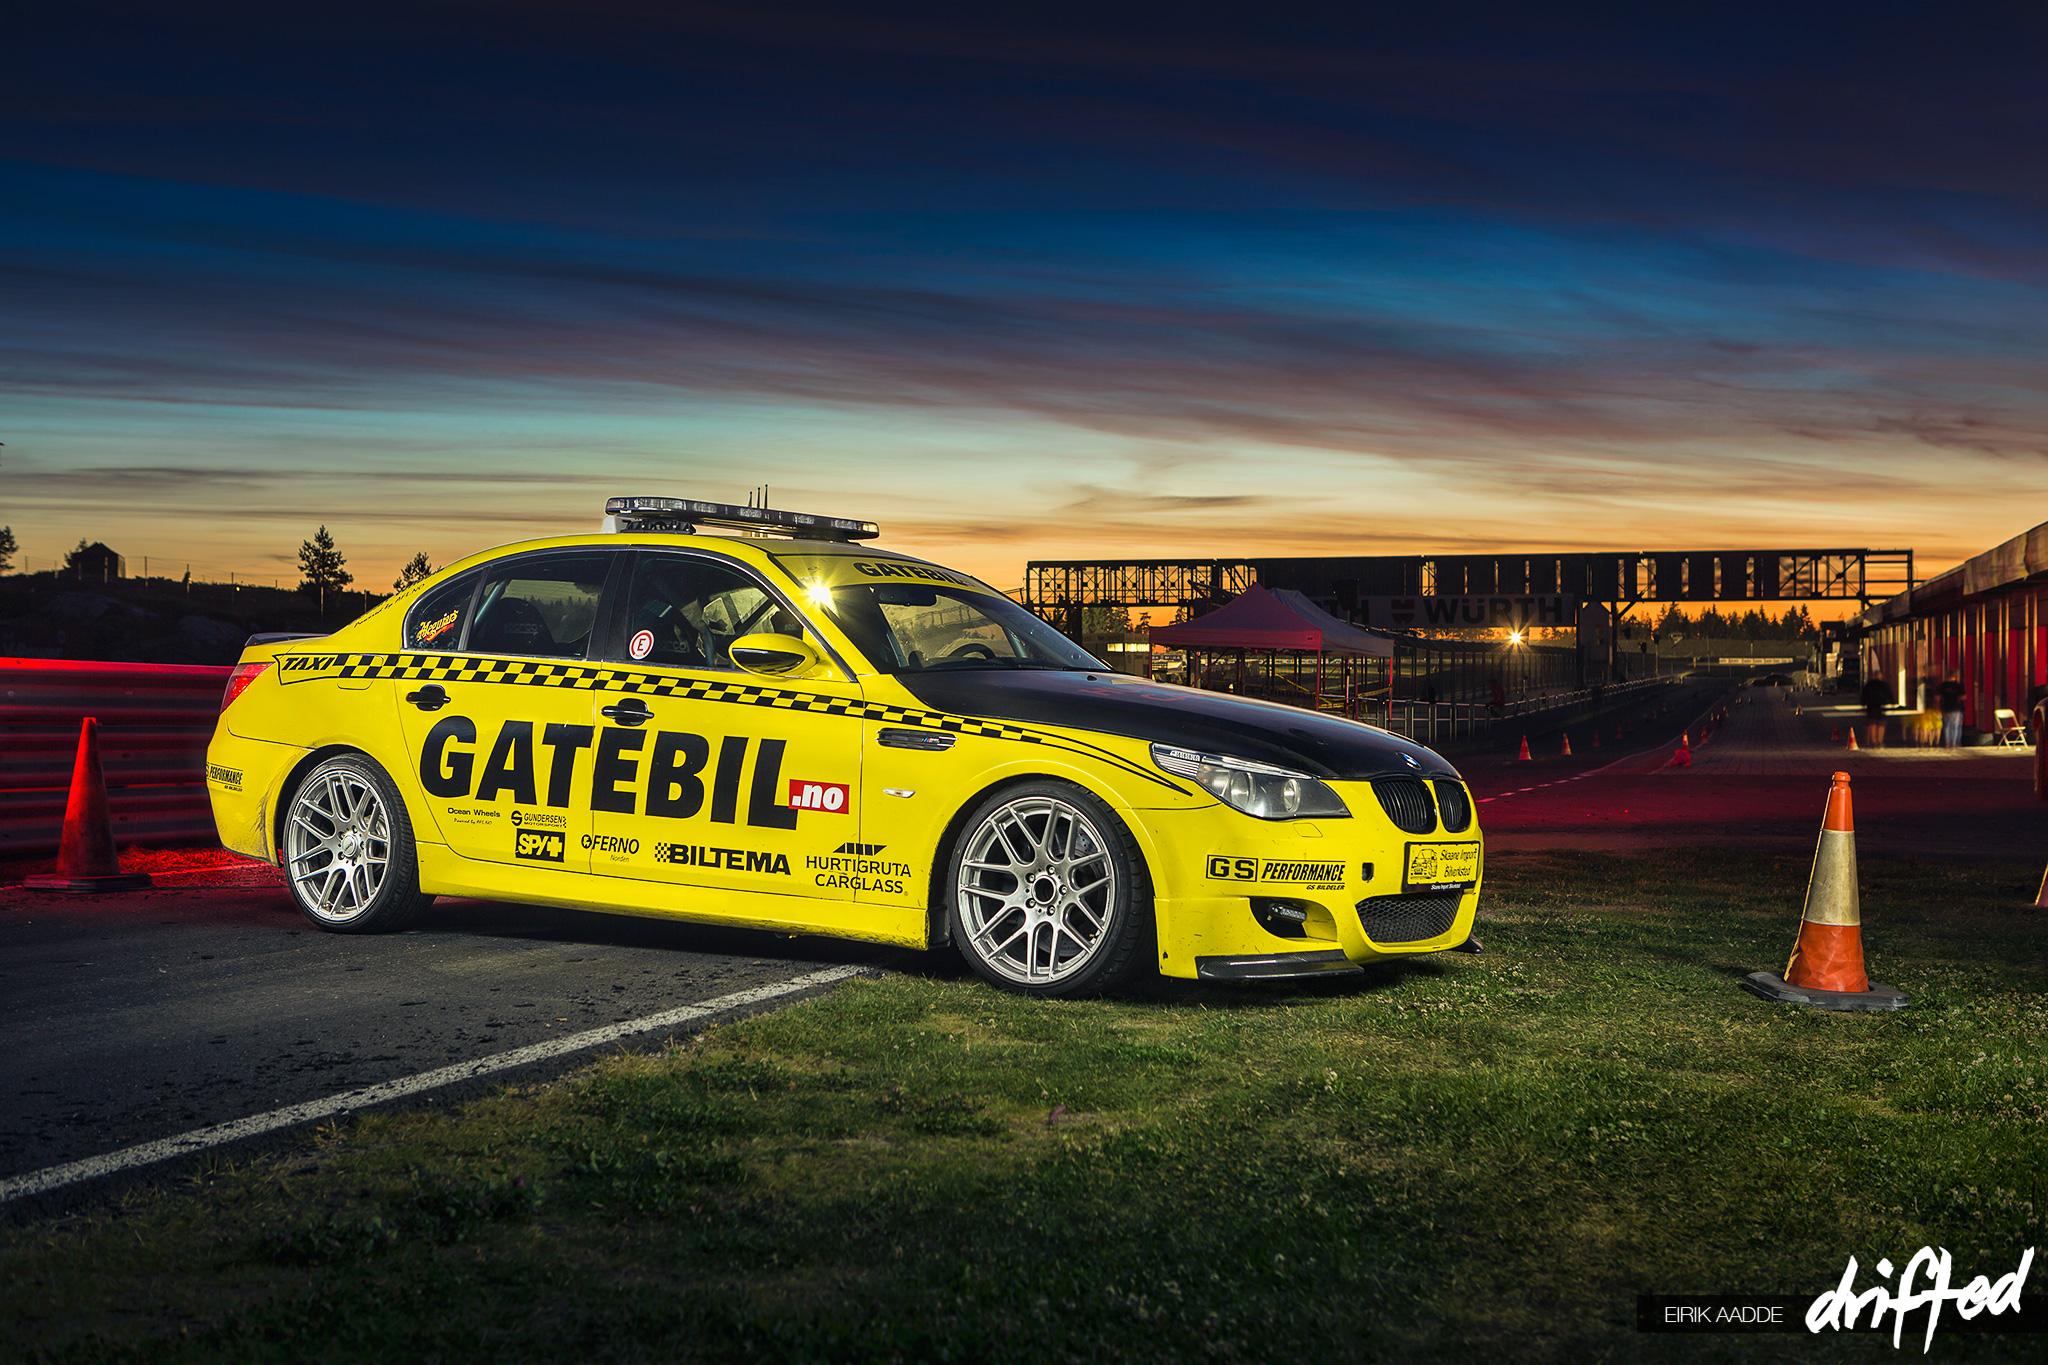 Gt86 Car Wallpaper Event Gatebil By Night Drifted Com